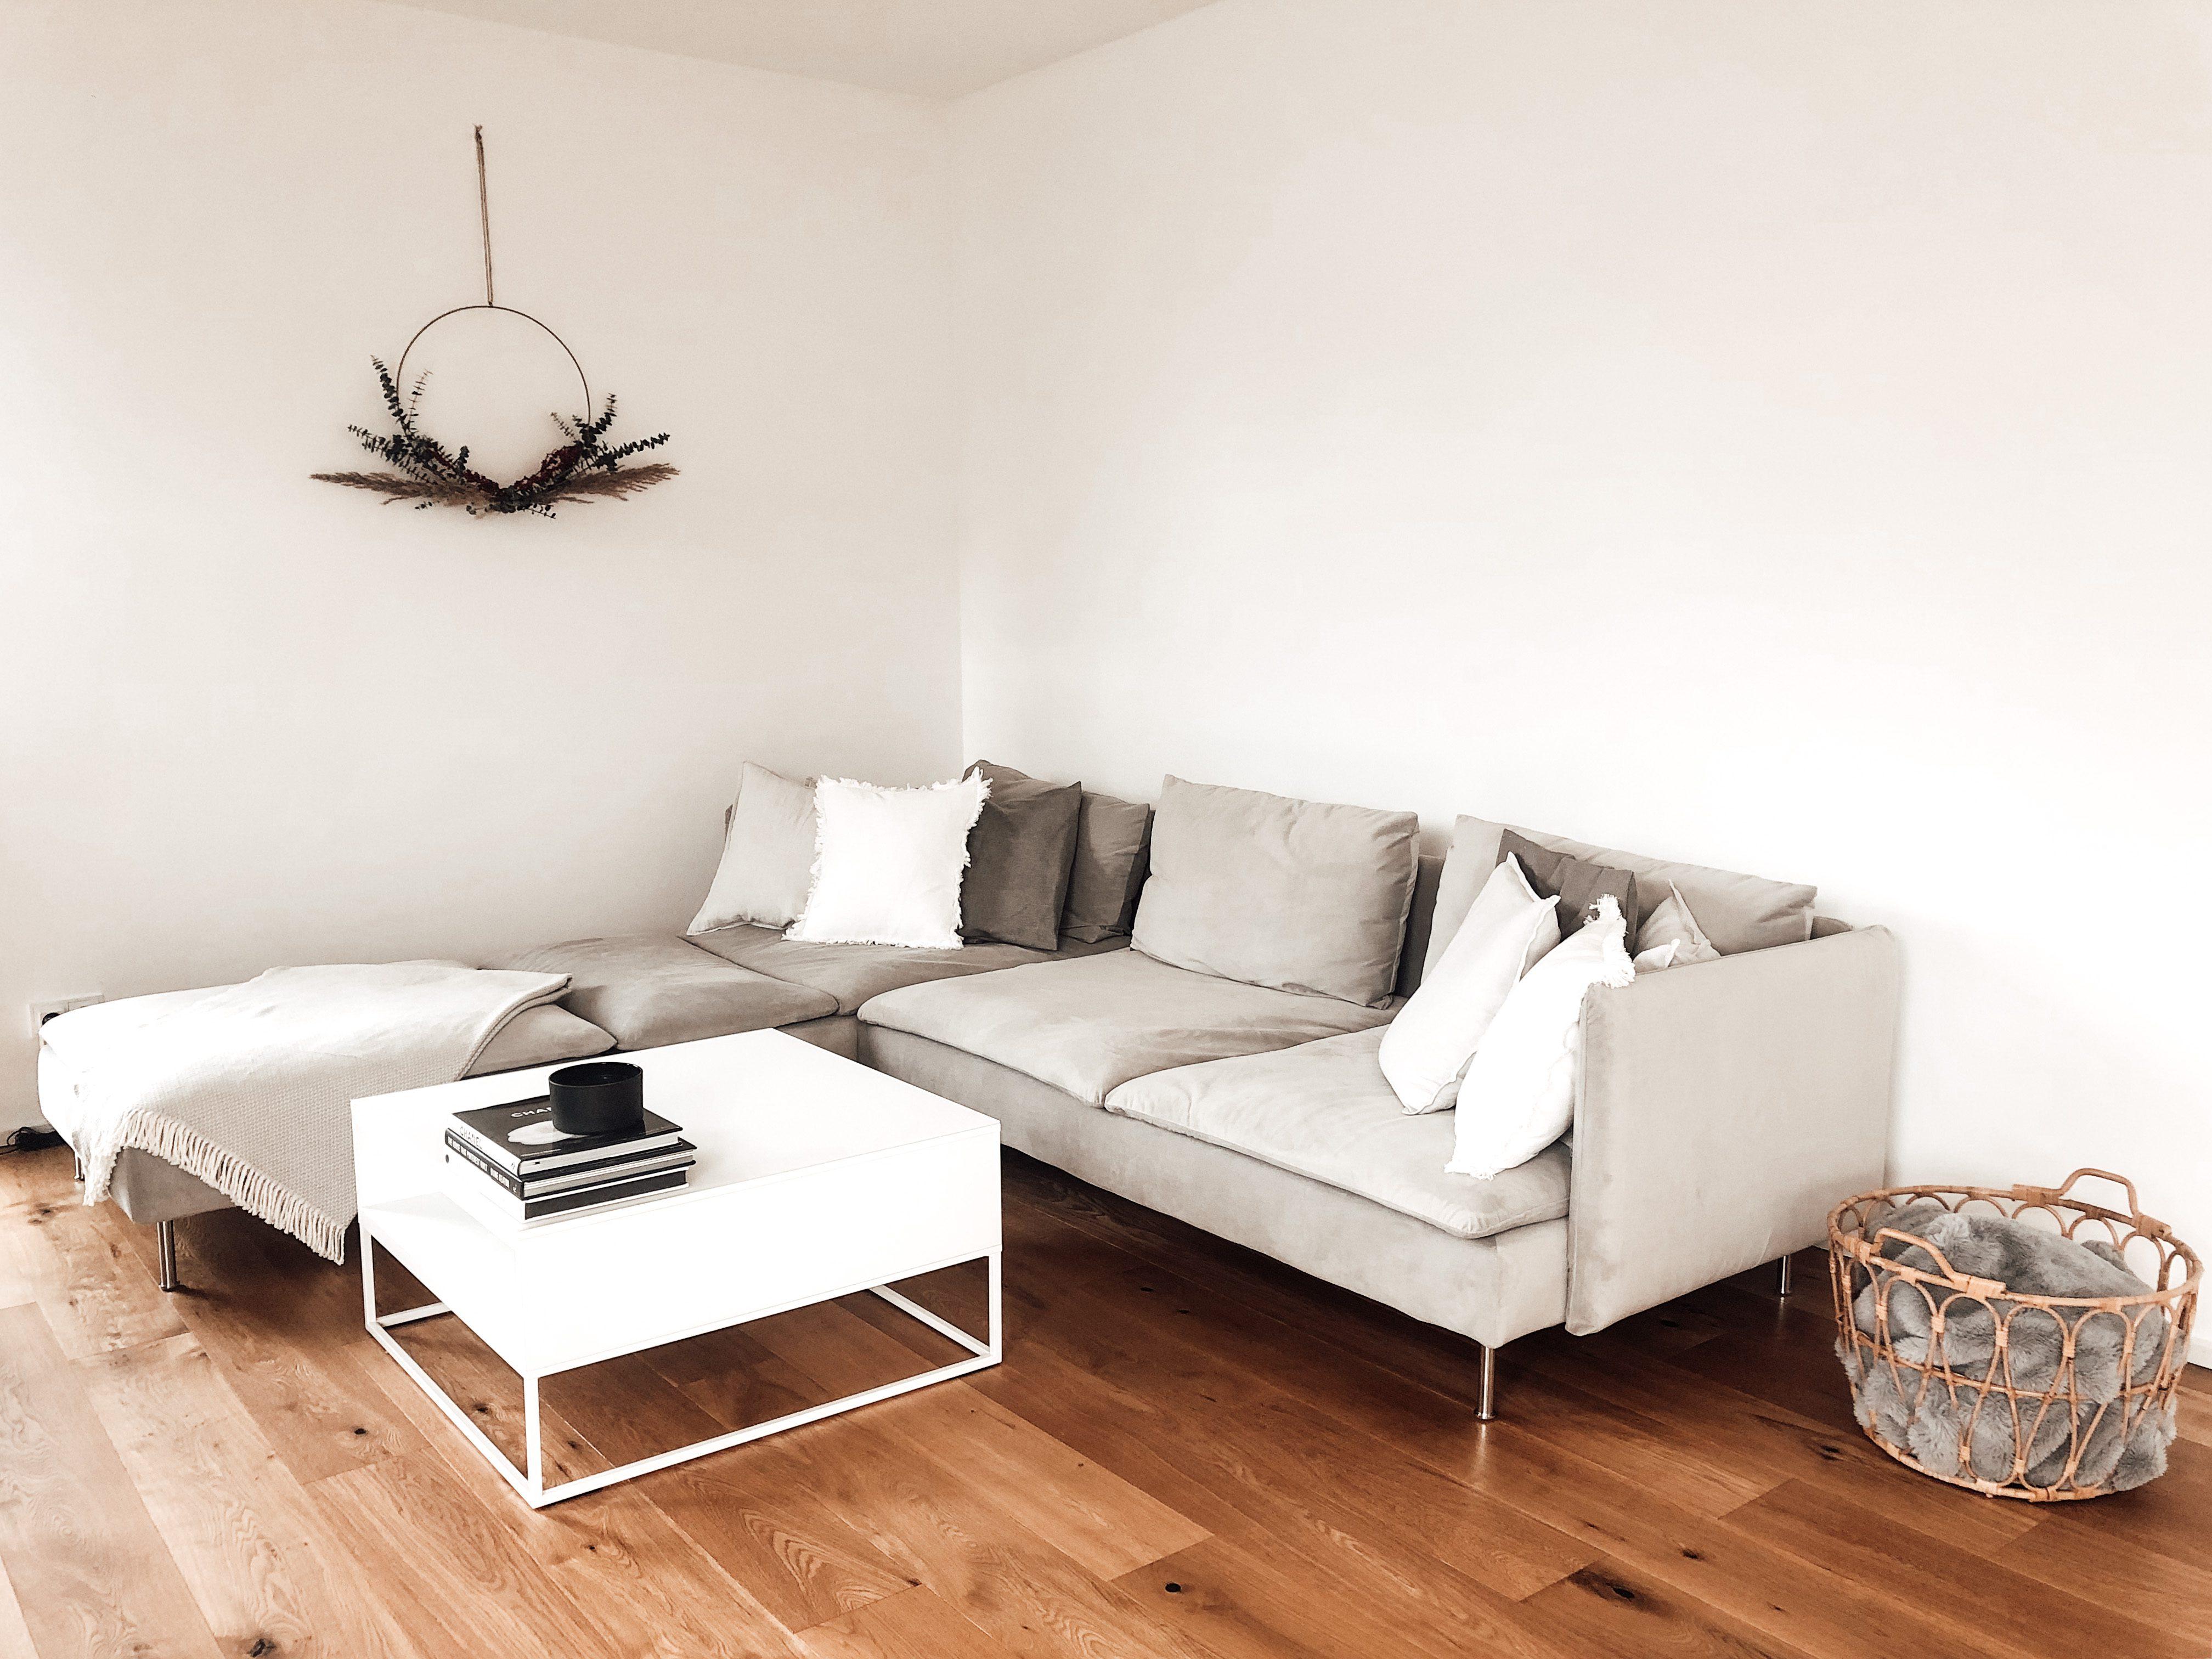 IKEAのSoderhamn/ソーデルハムンの設置事例。完璧な組み合わせで北欧風コーナーソファ兼デイベッドの完成